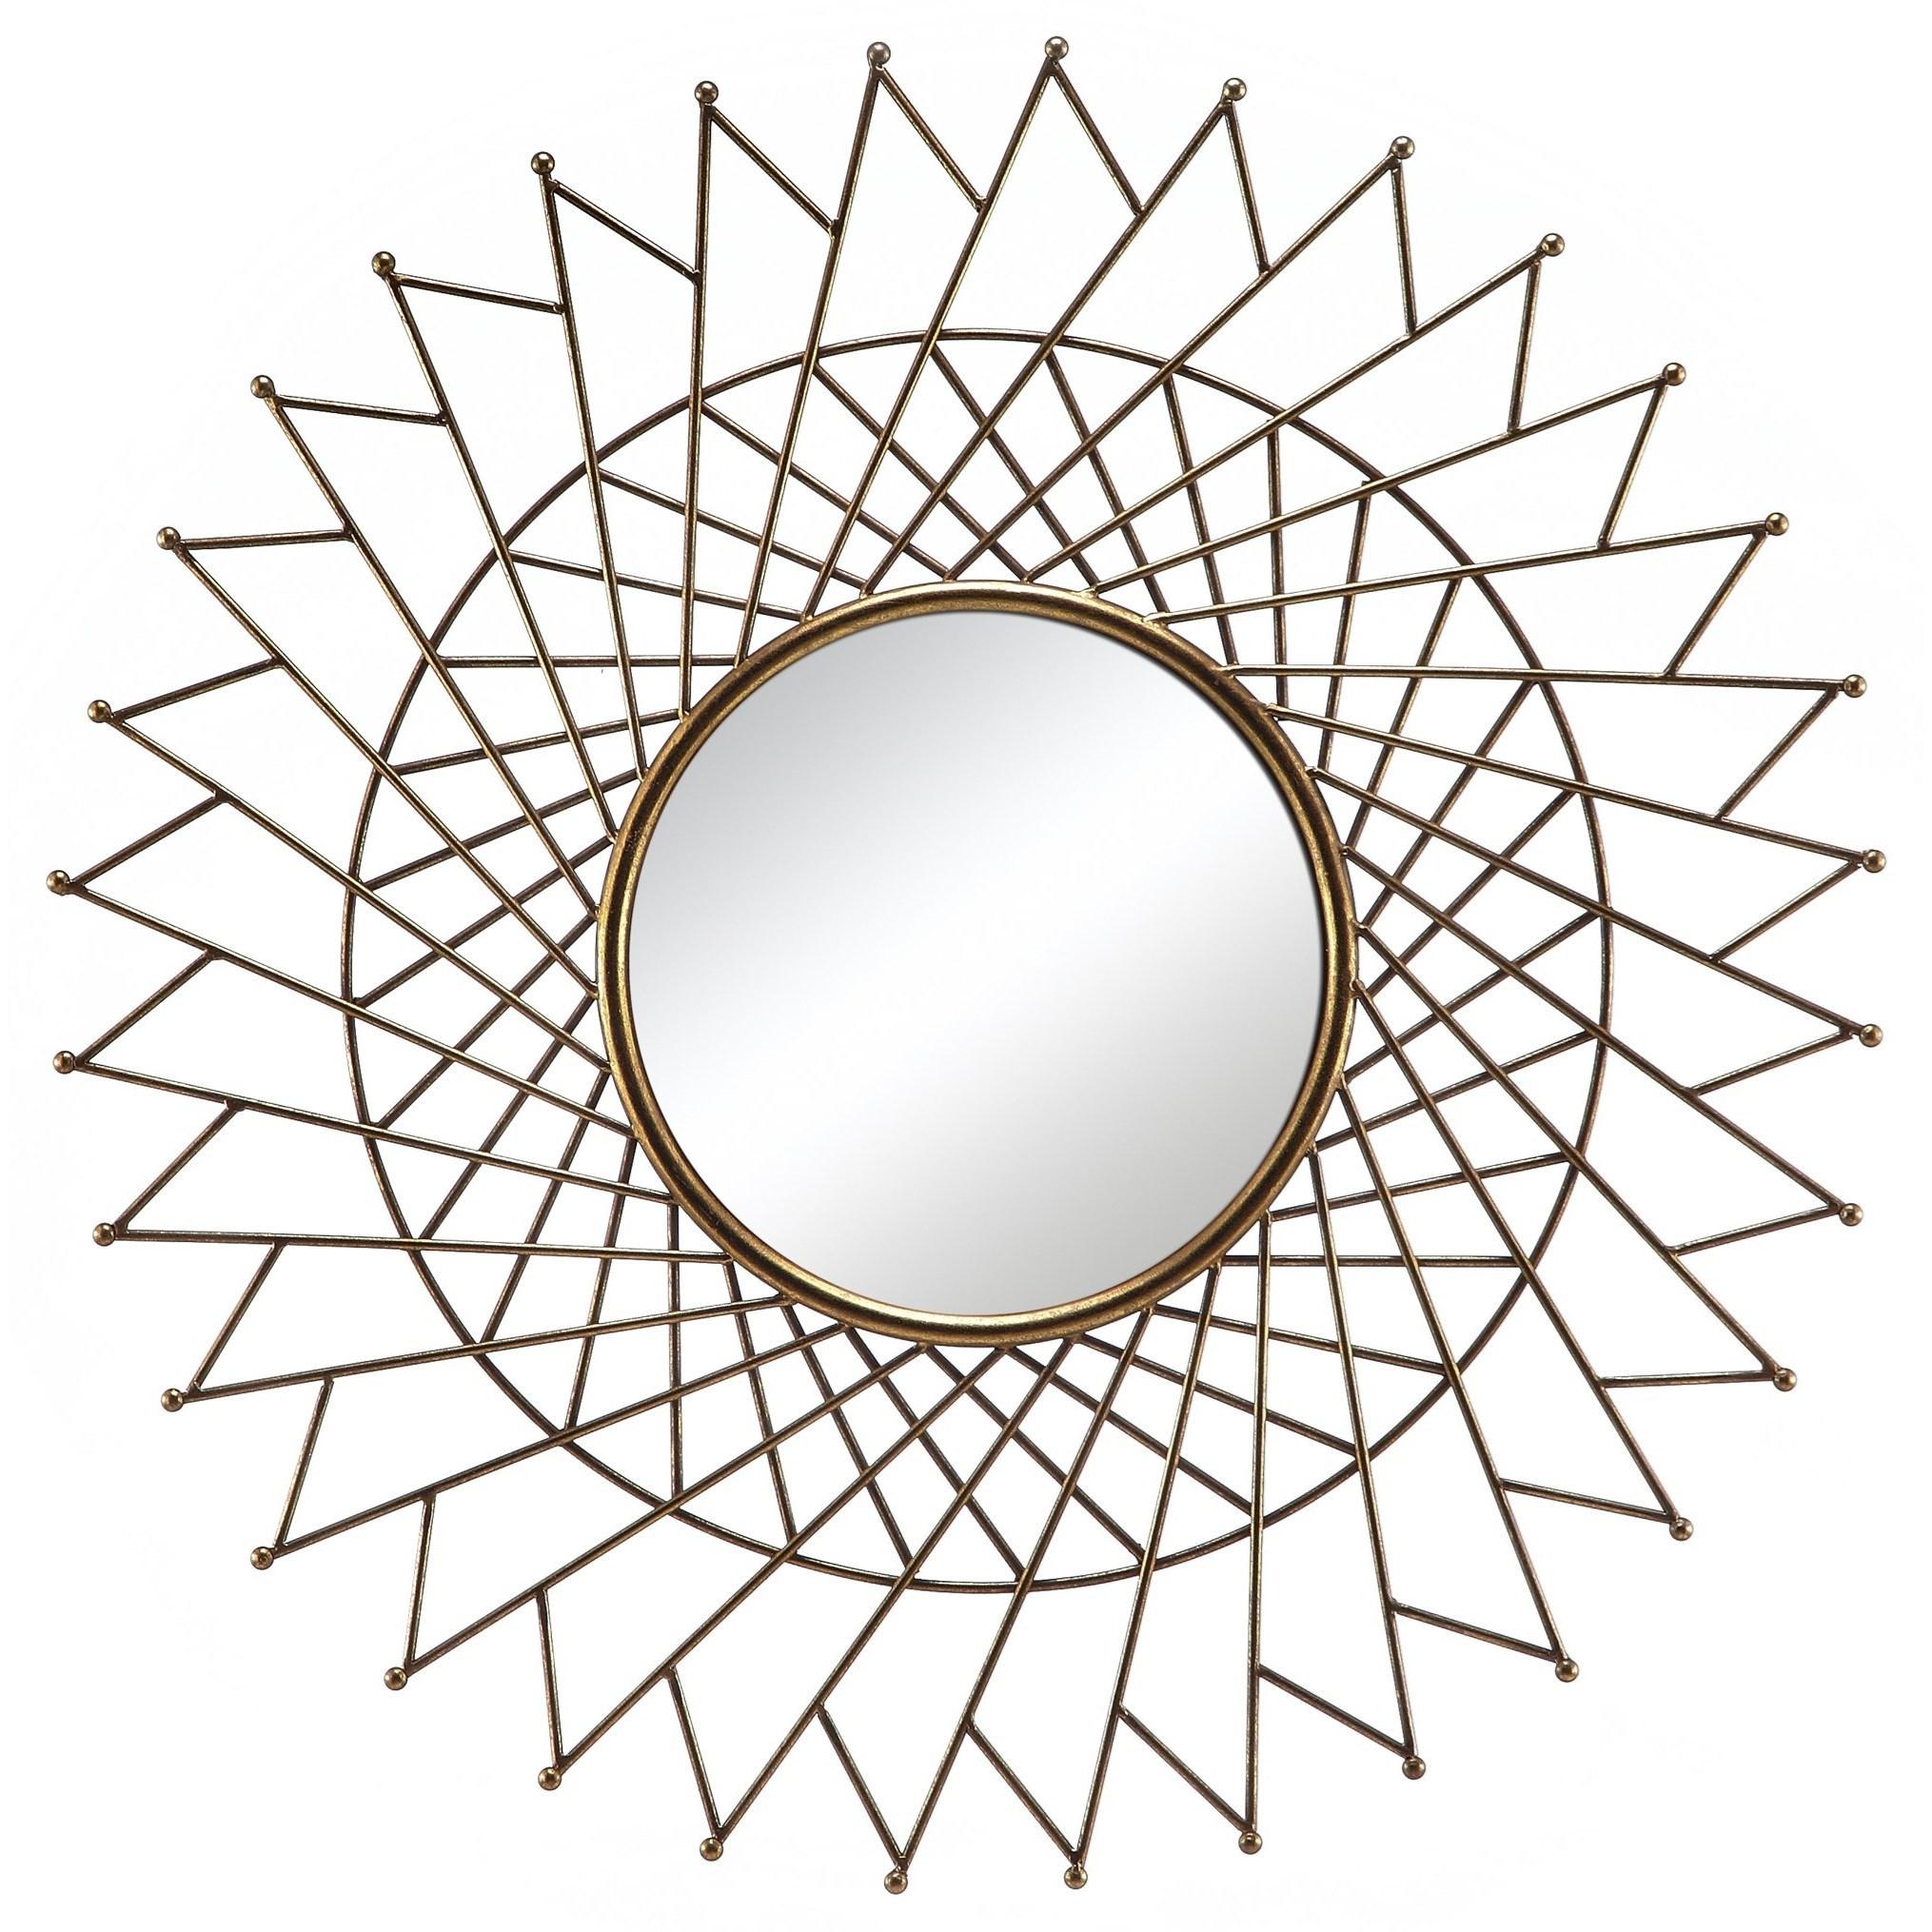 Mirrors Zelda Wall Mirror by Stein World at Johnny Janosik